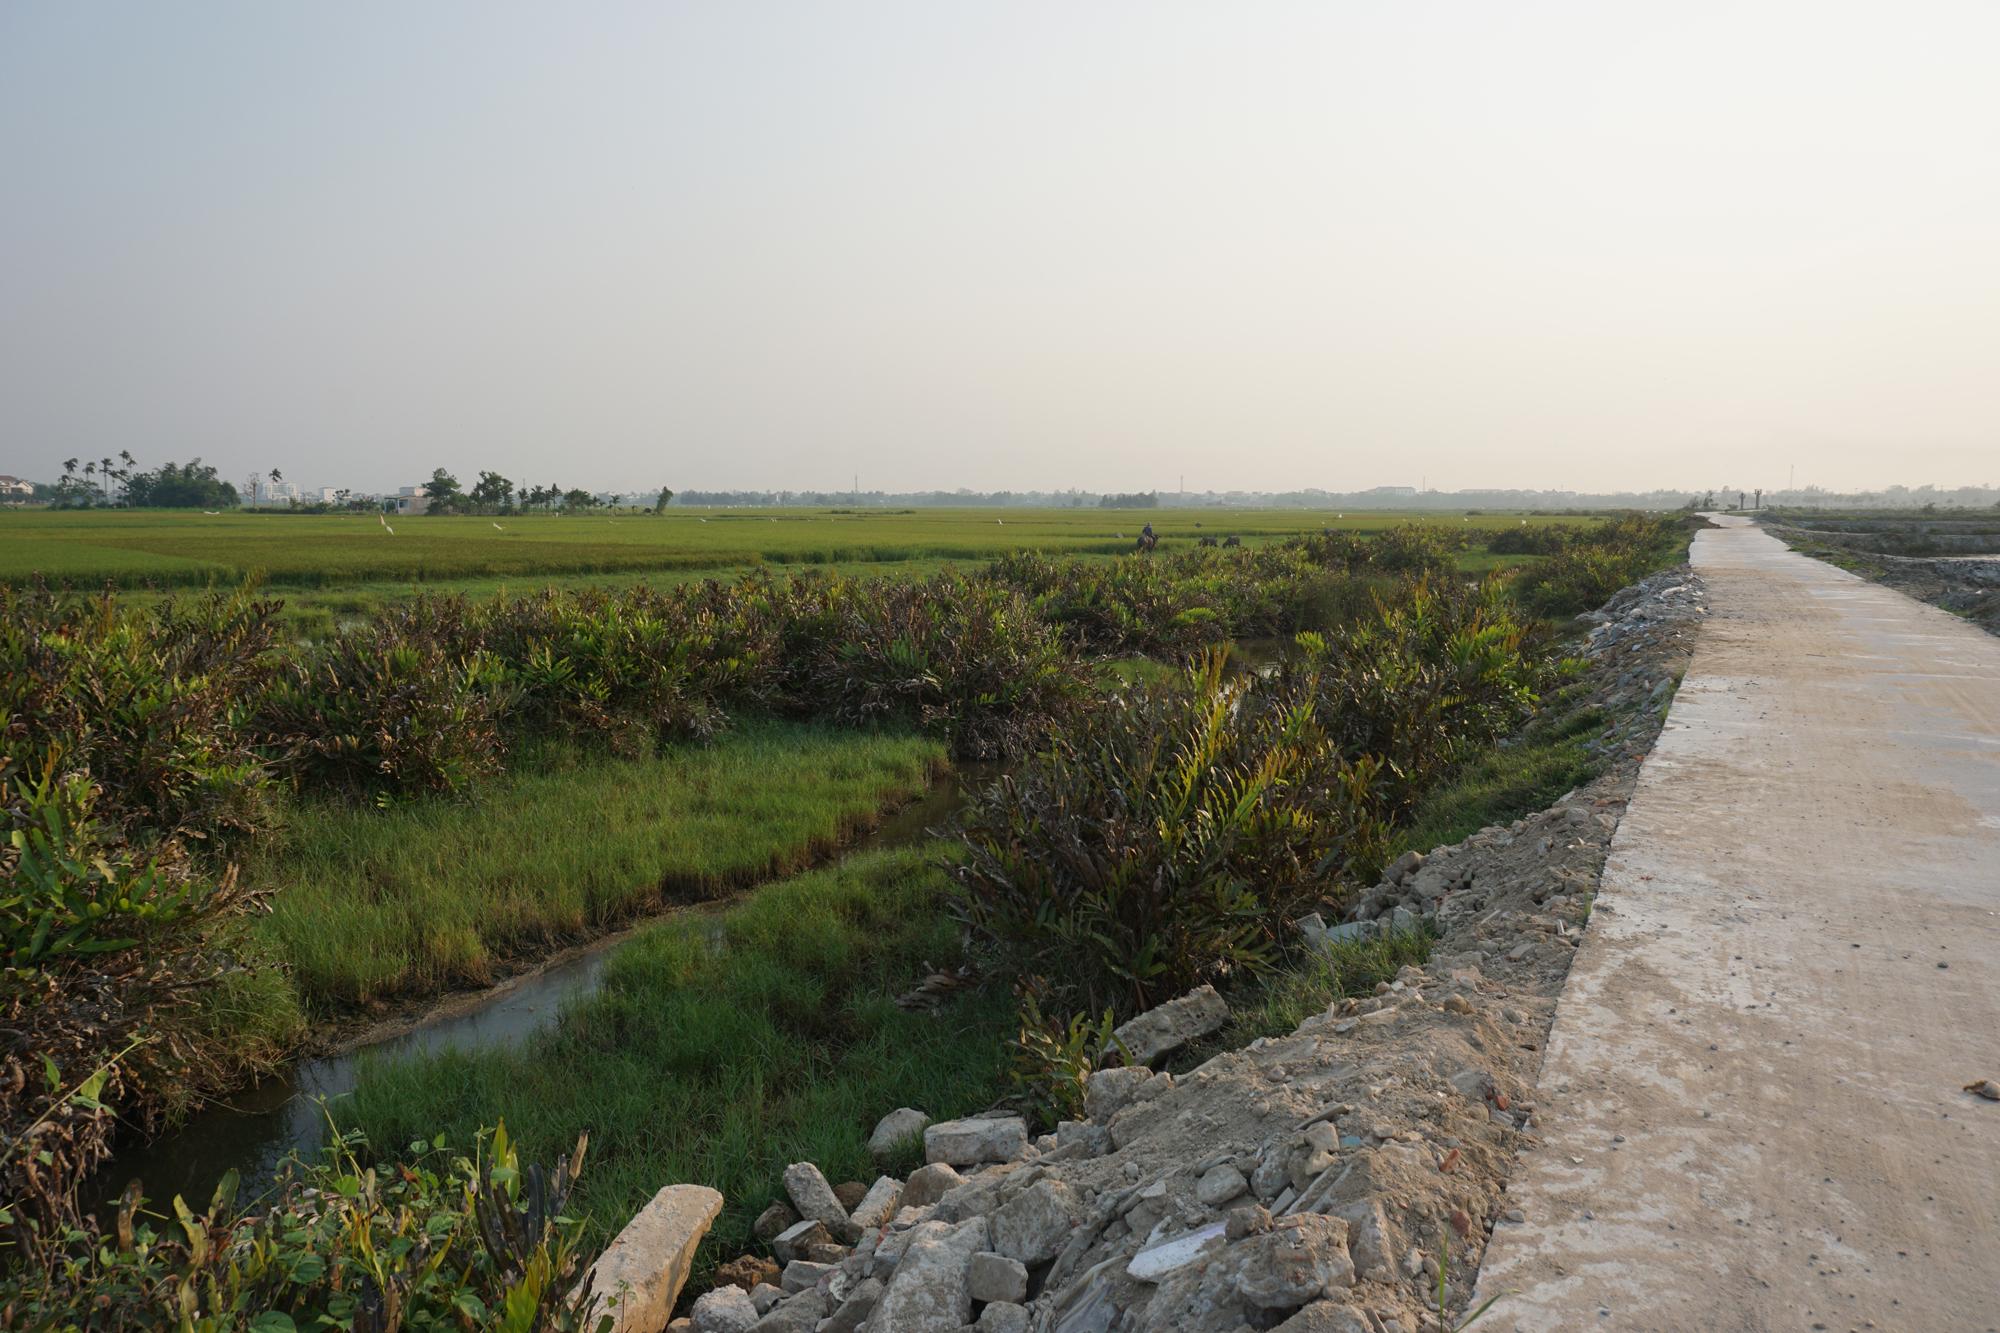 Biking through rice fields outside of Hoi An